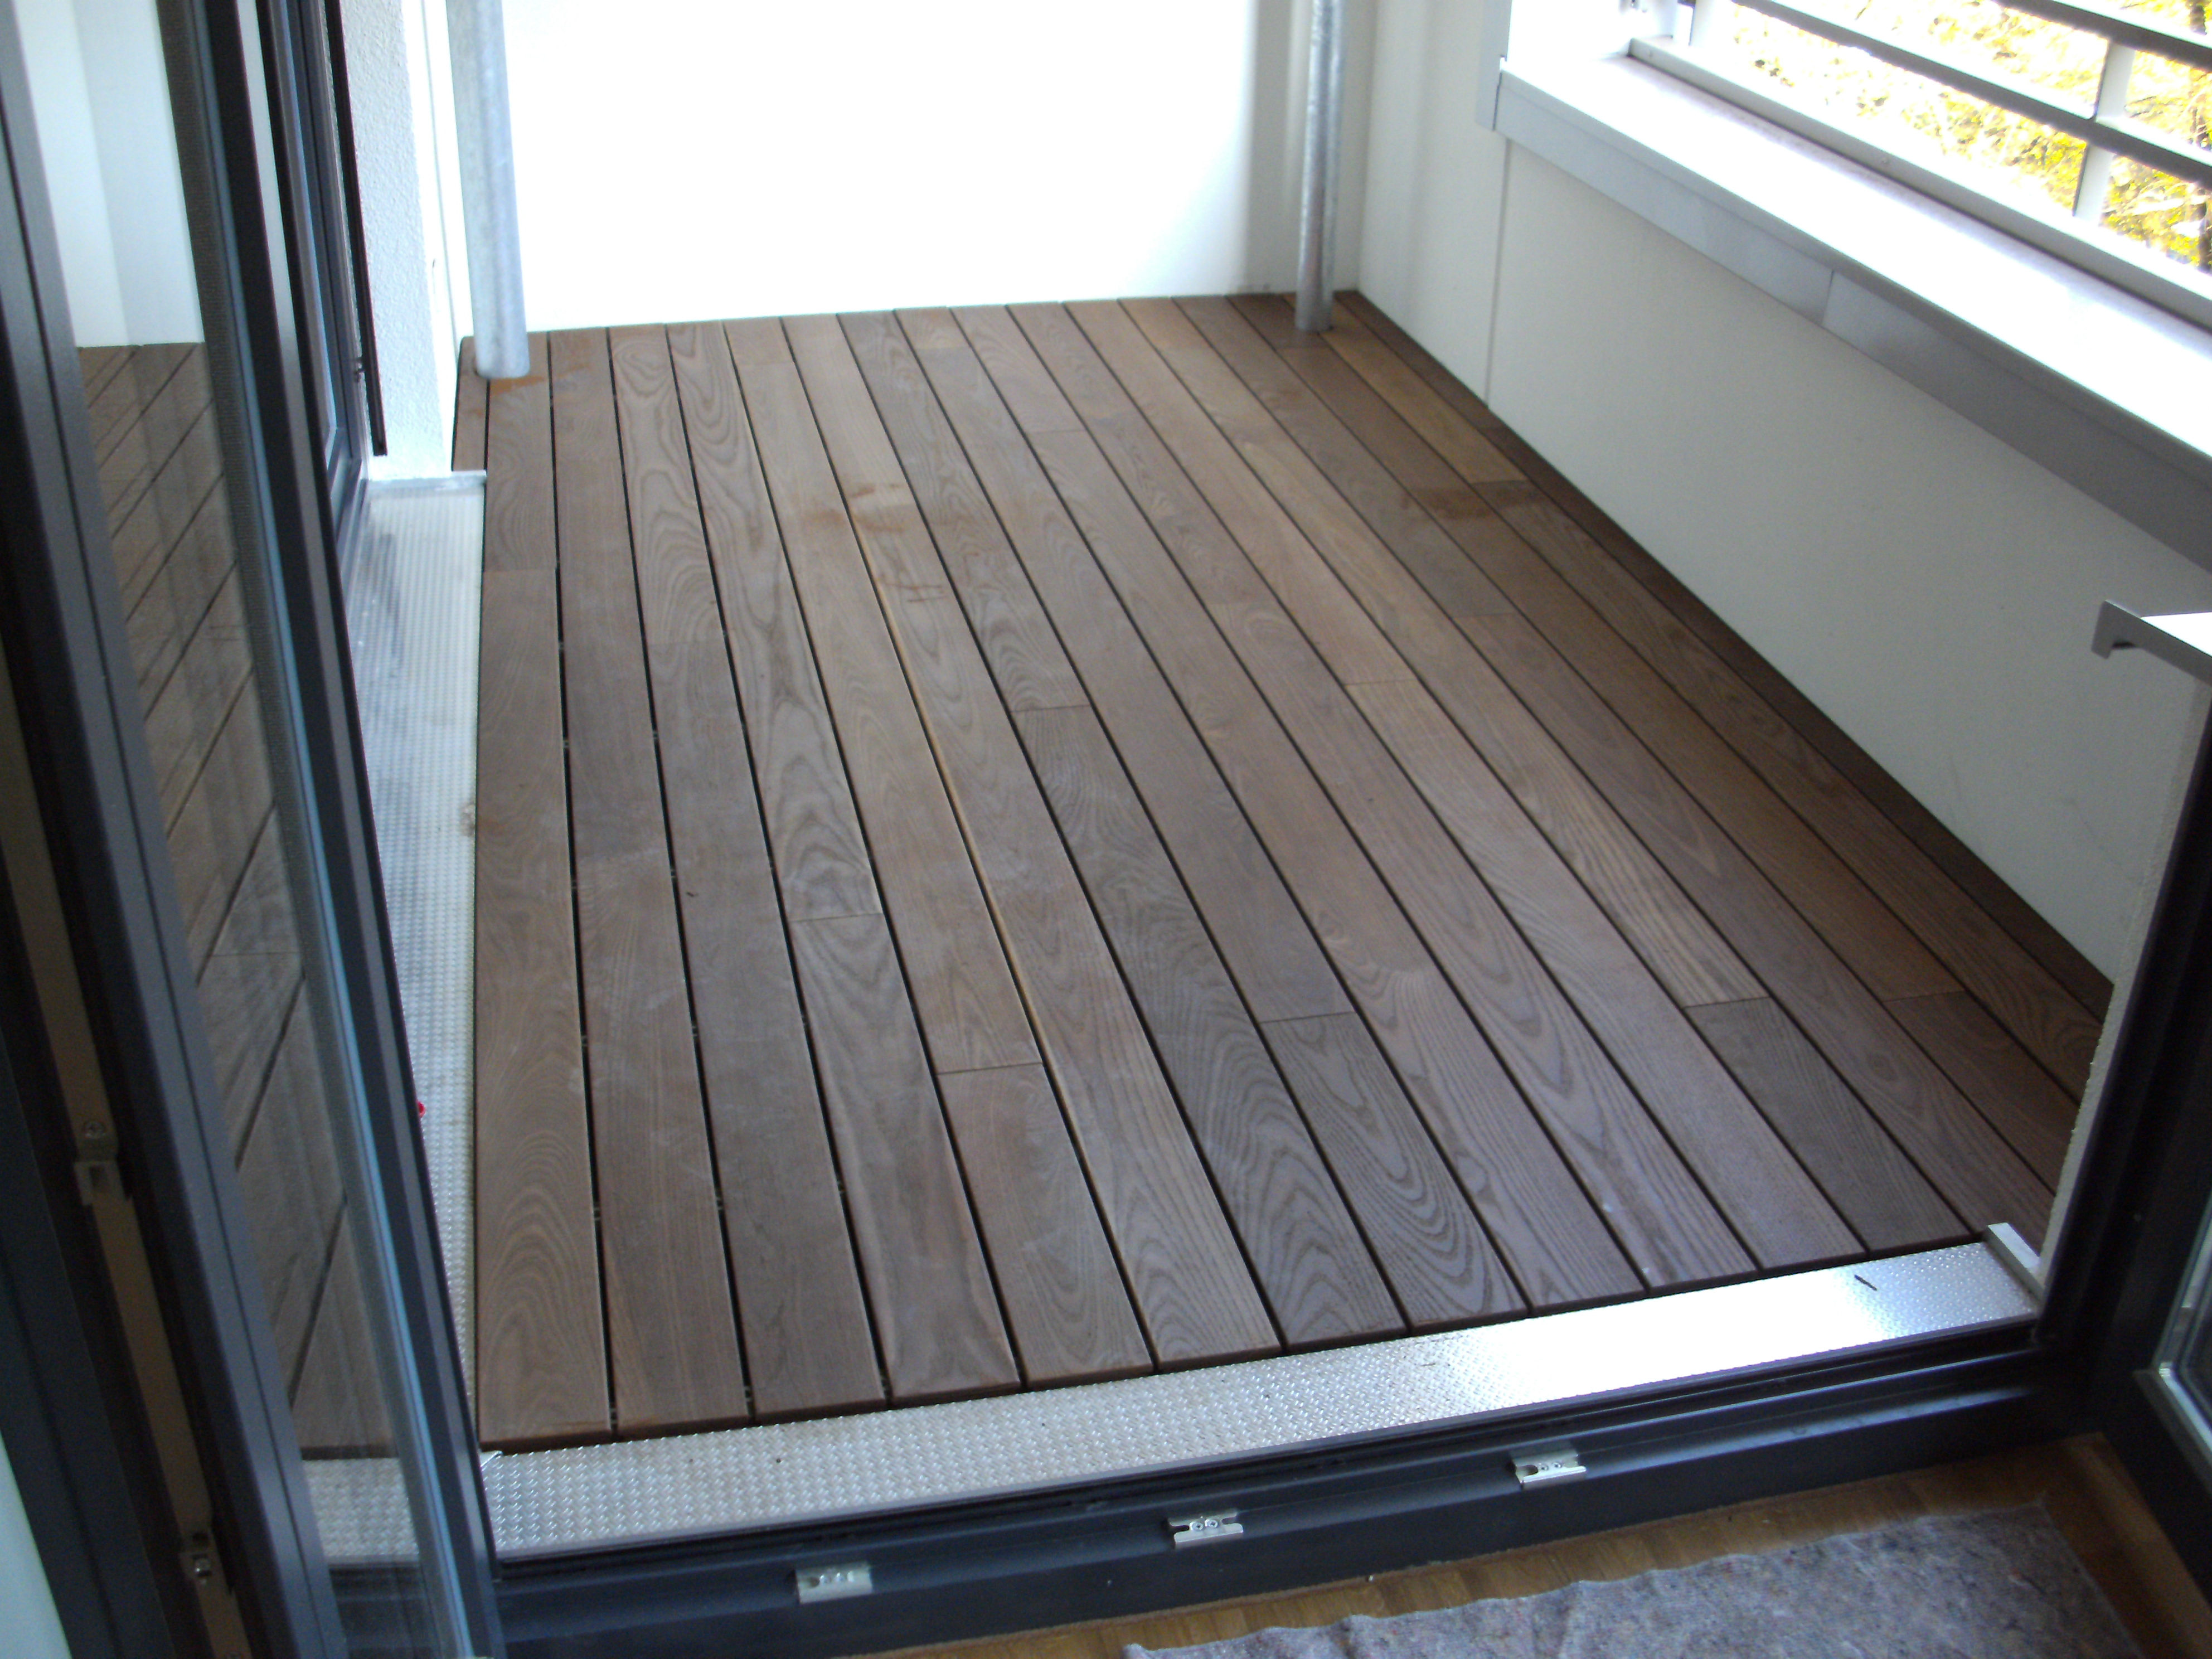 balkonbelag holz kreative ideen f r innendekoration und. Black Bedroom Furniture Sets. Home Design Ideas